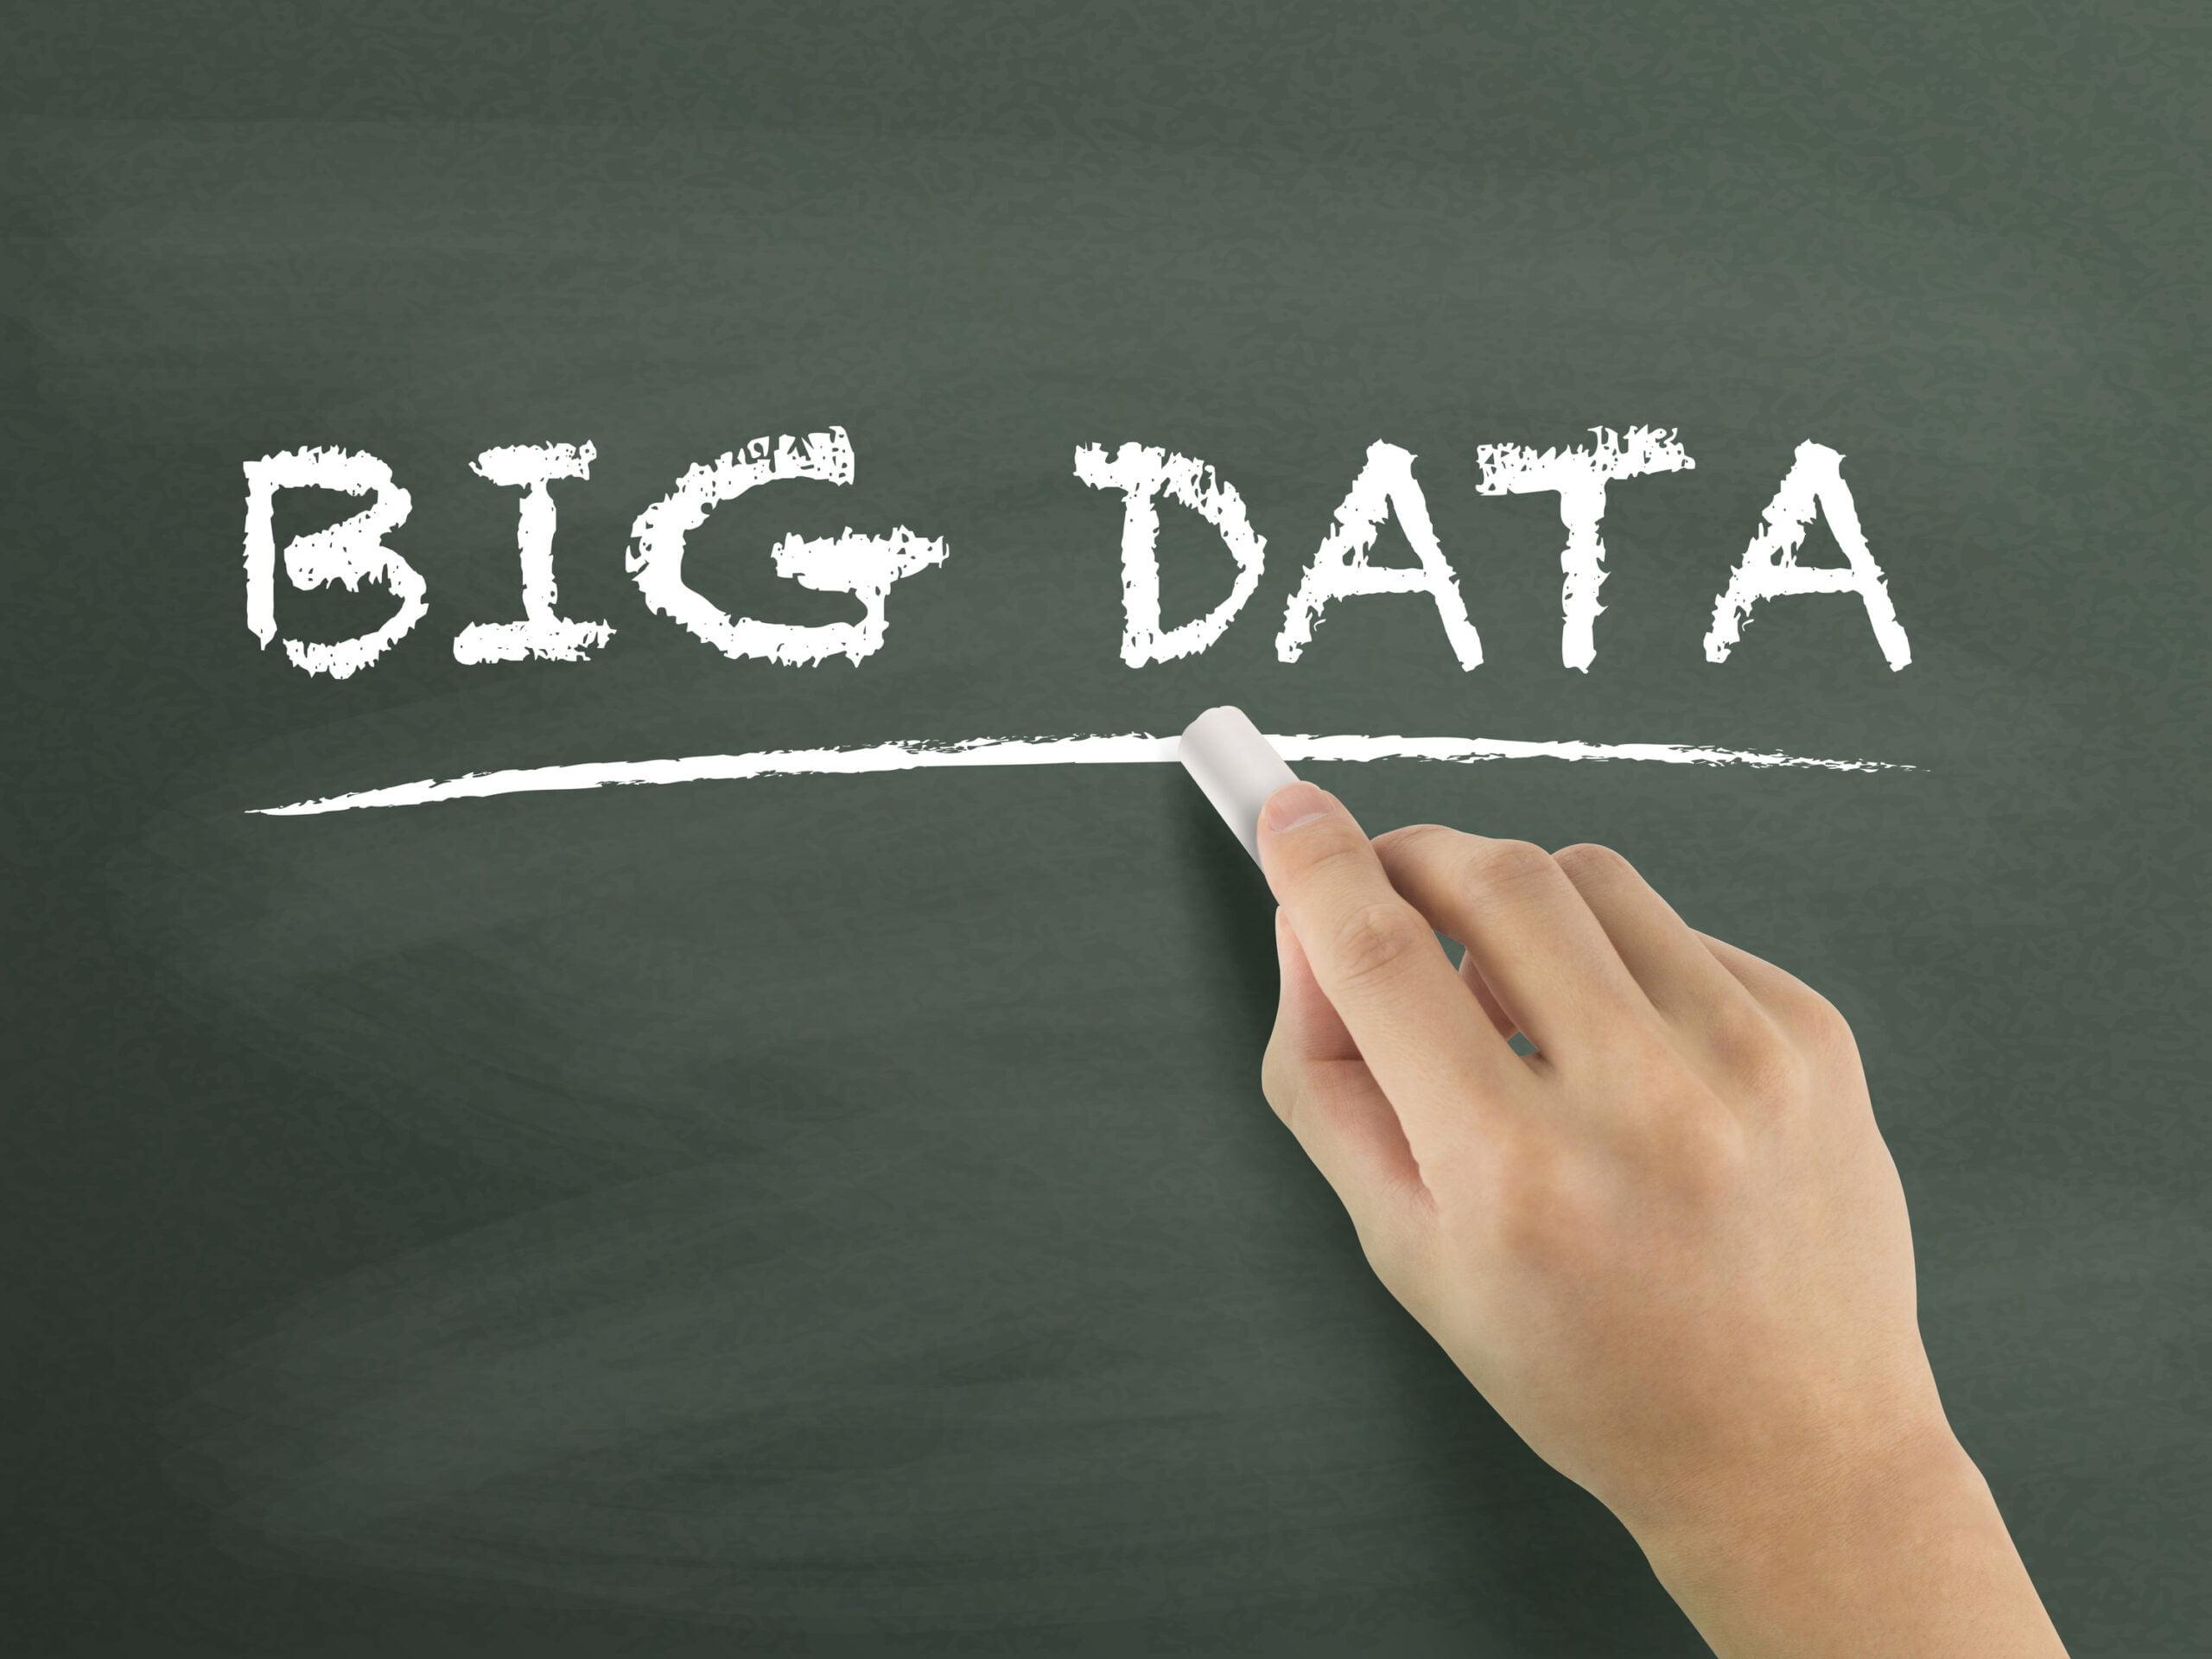 This months industry spotlight is big data analytics!